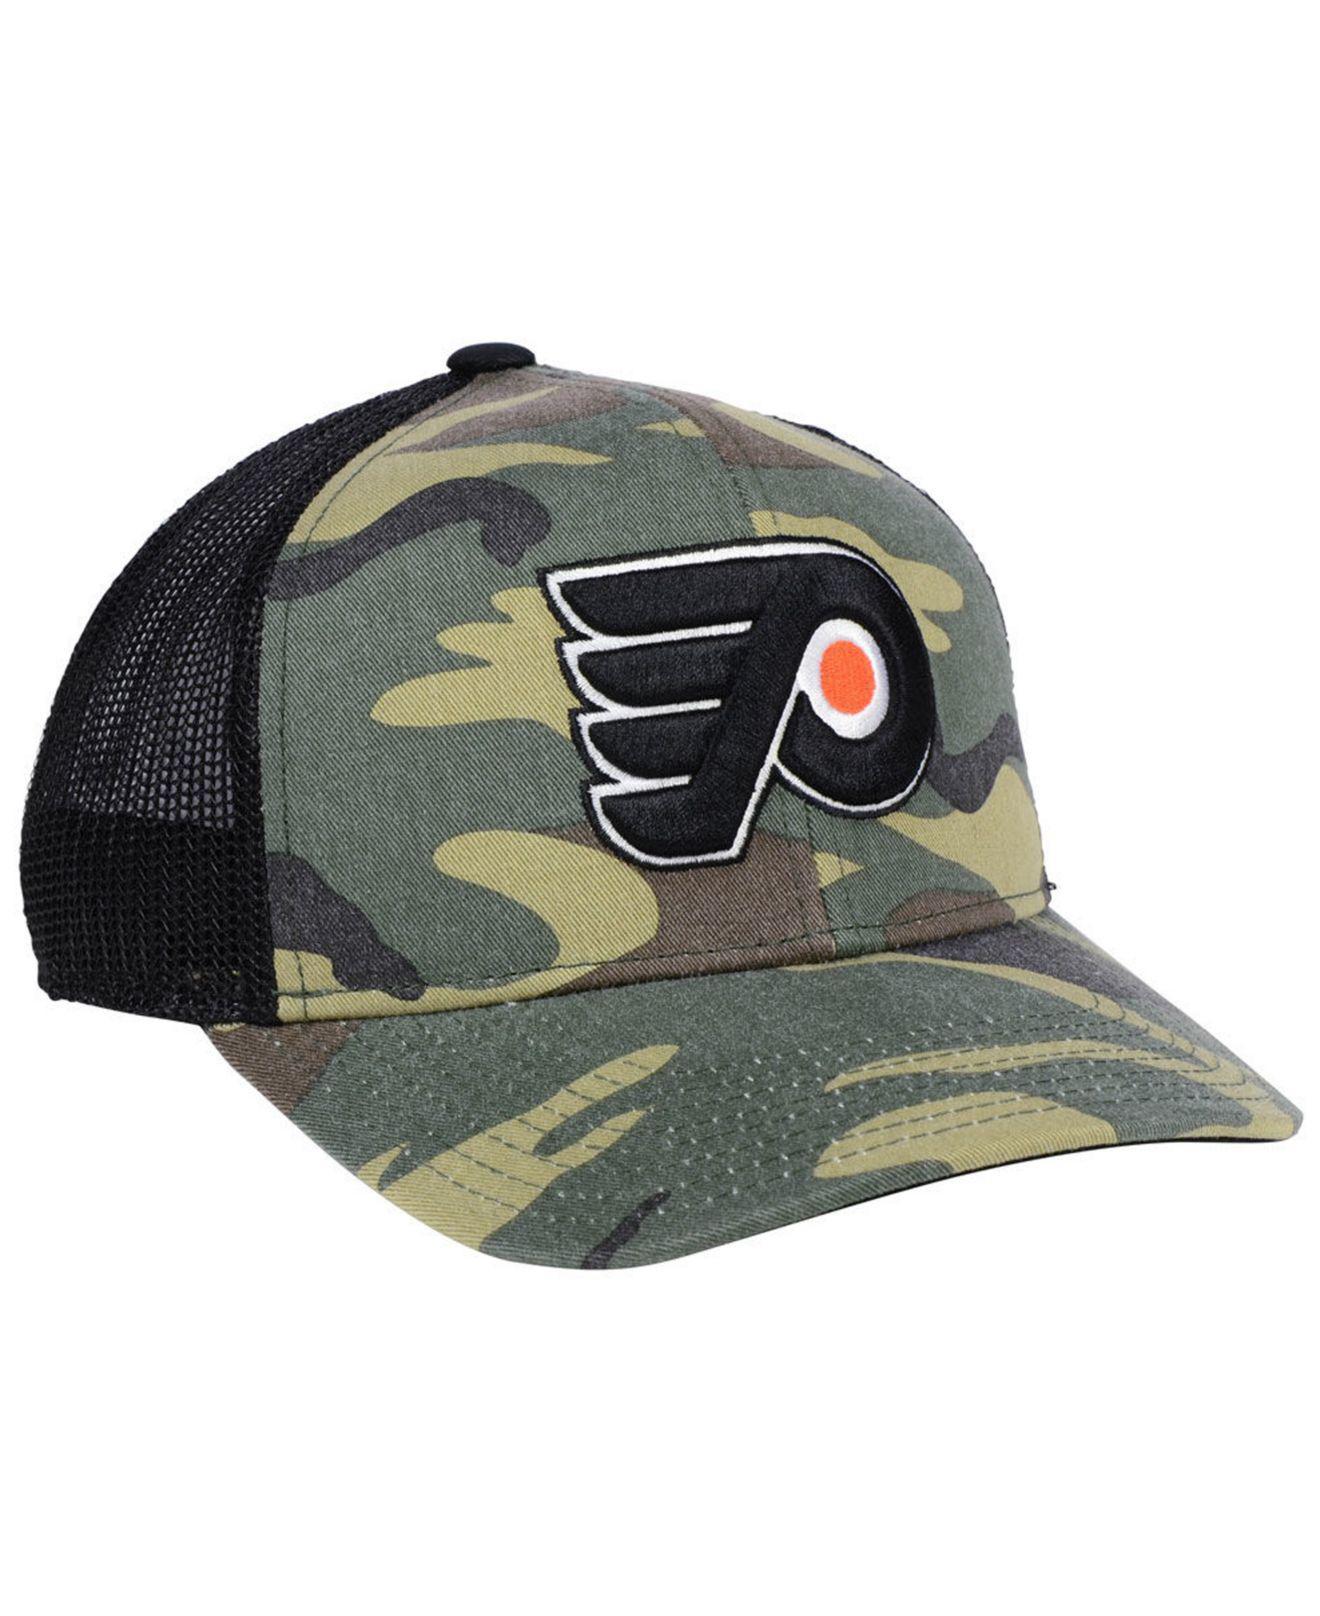 Lyst - adidas Philadelphia Flyers Camo Trucker Cap for Men 571781231ce